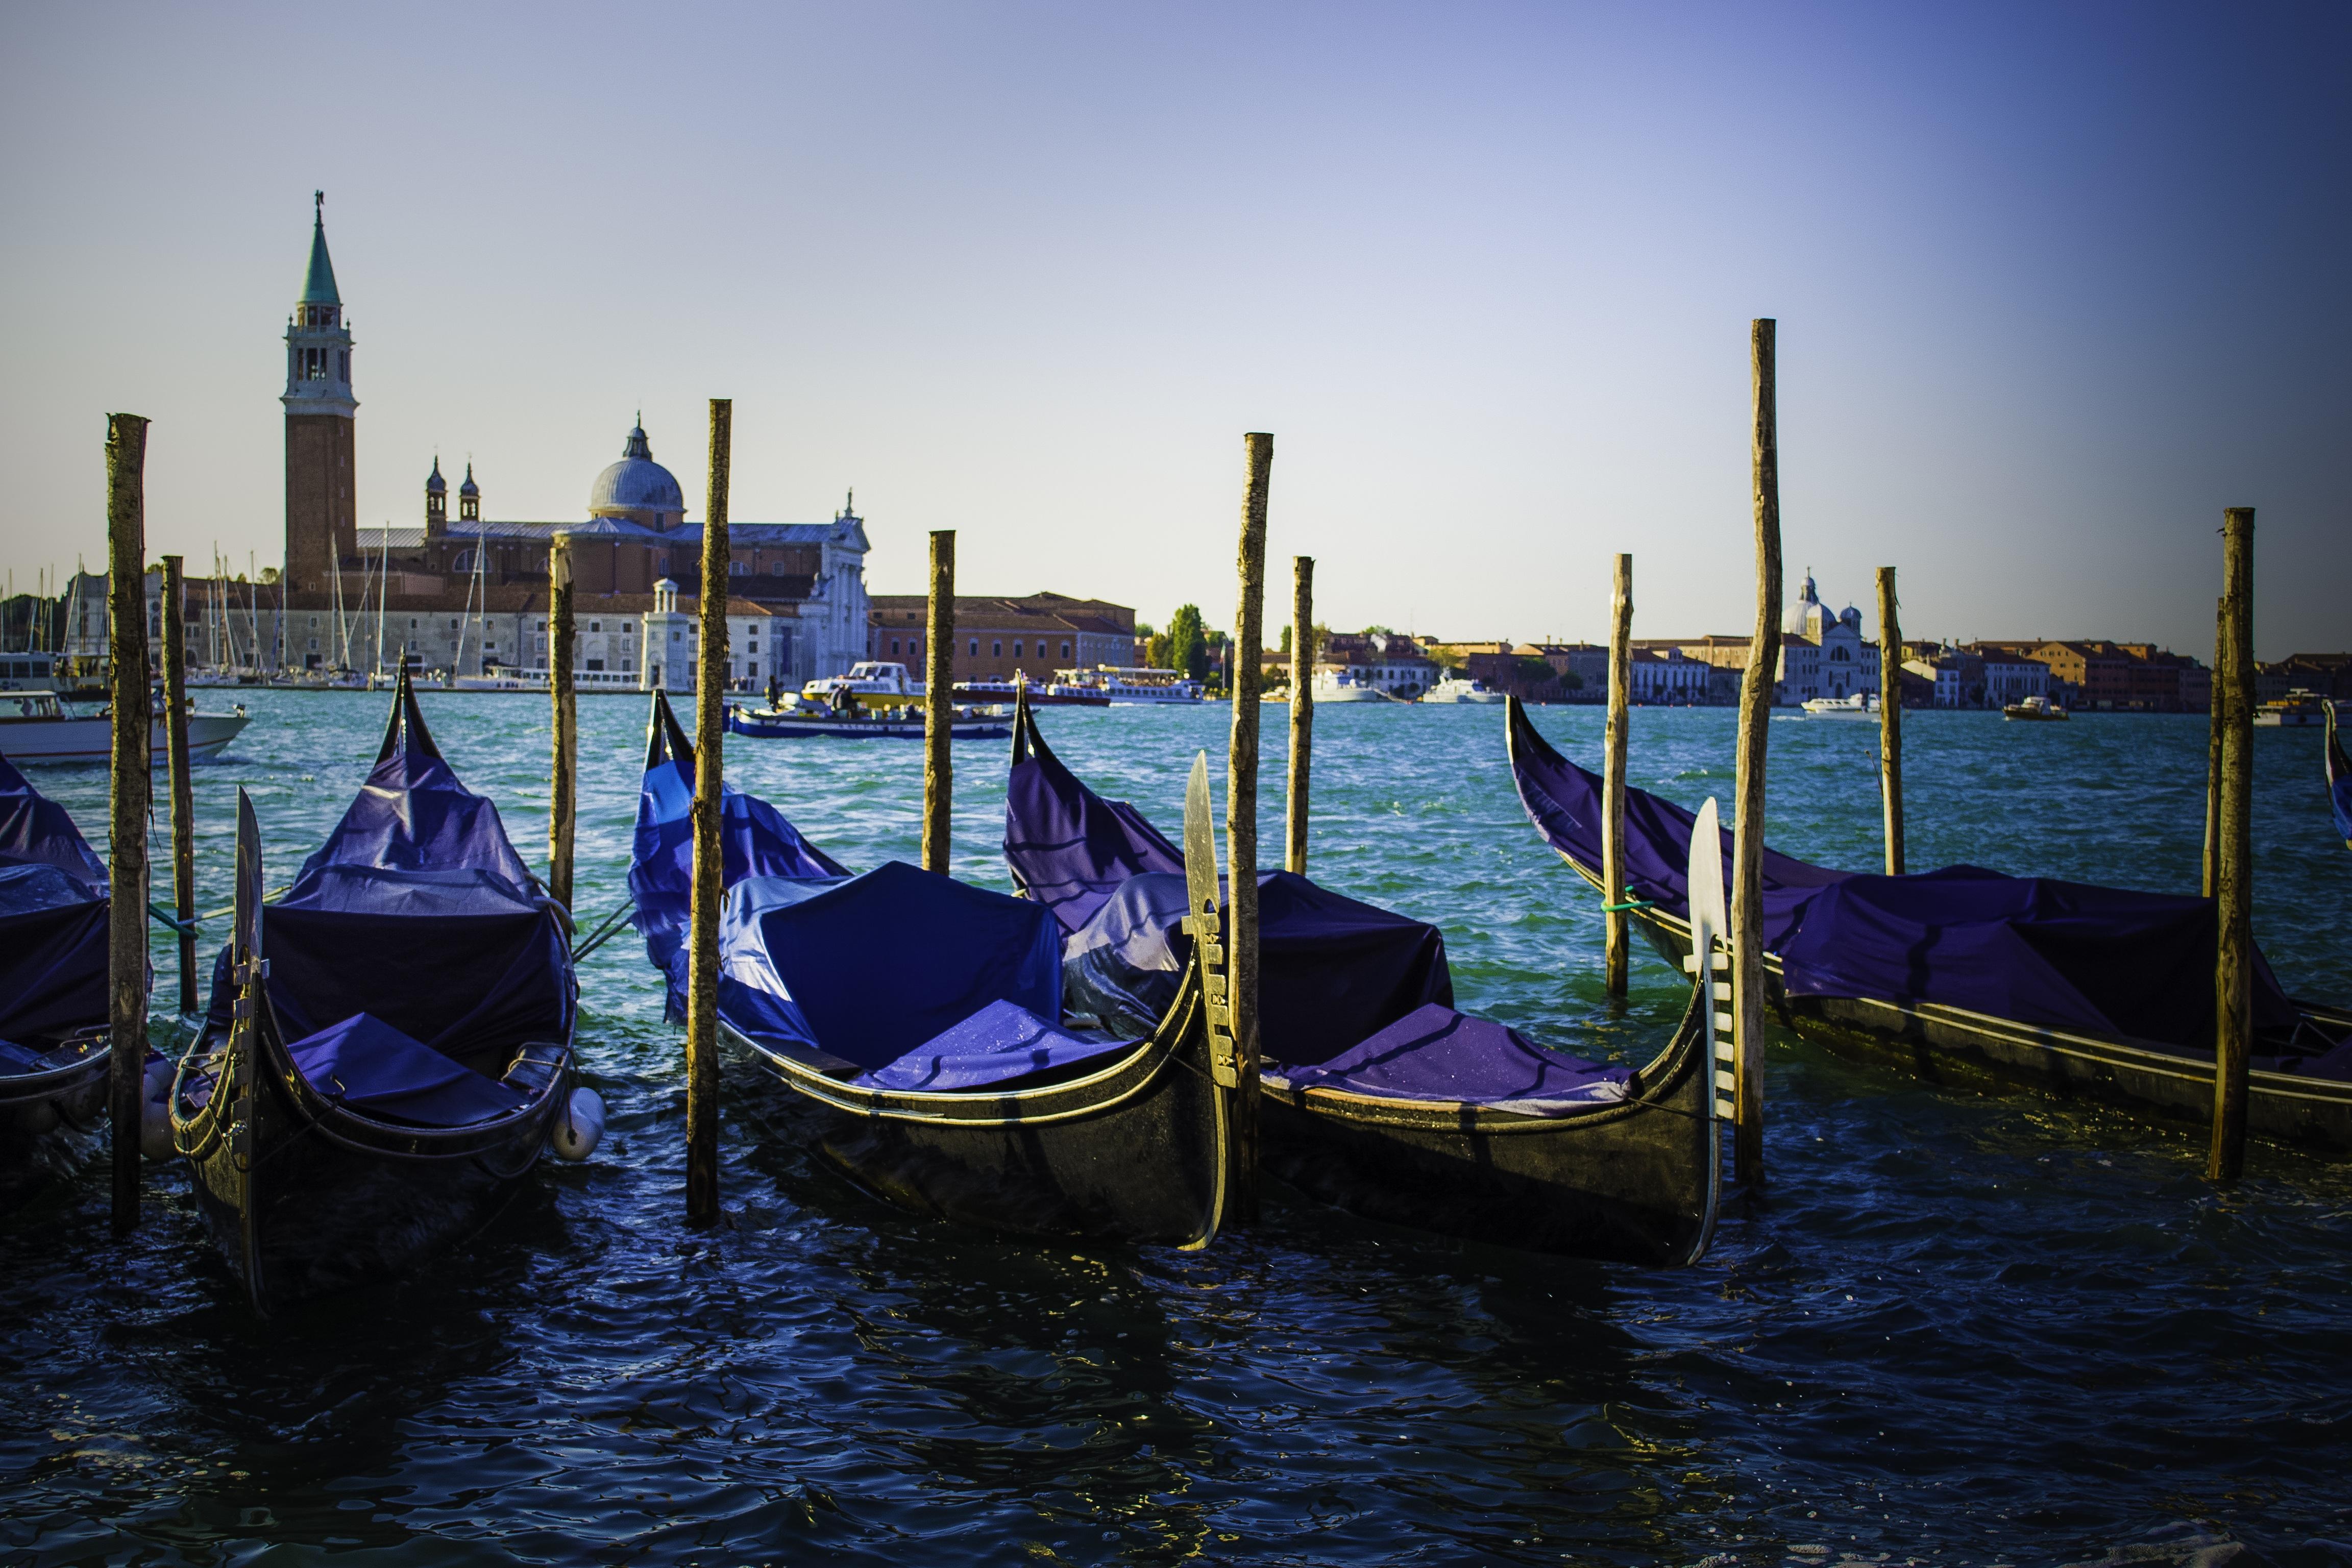 италия лодки картинки меня осталось